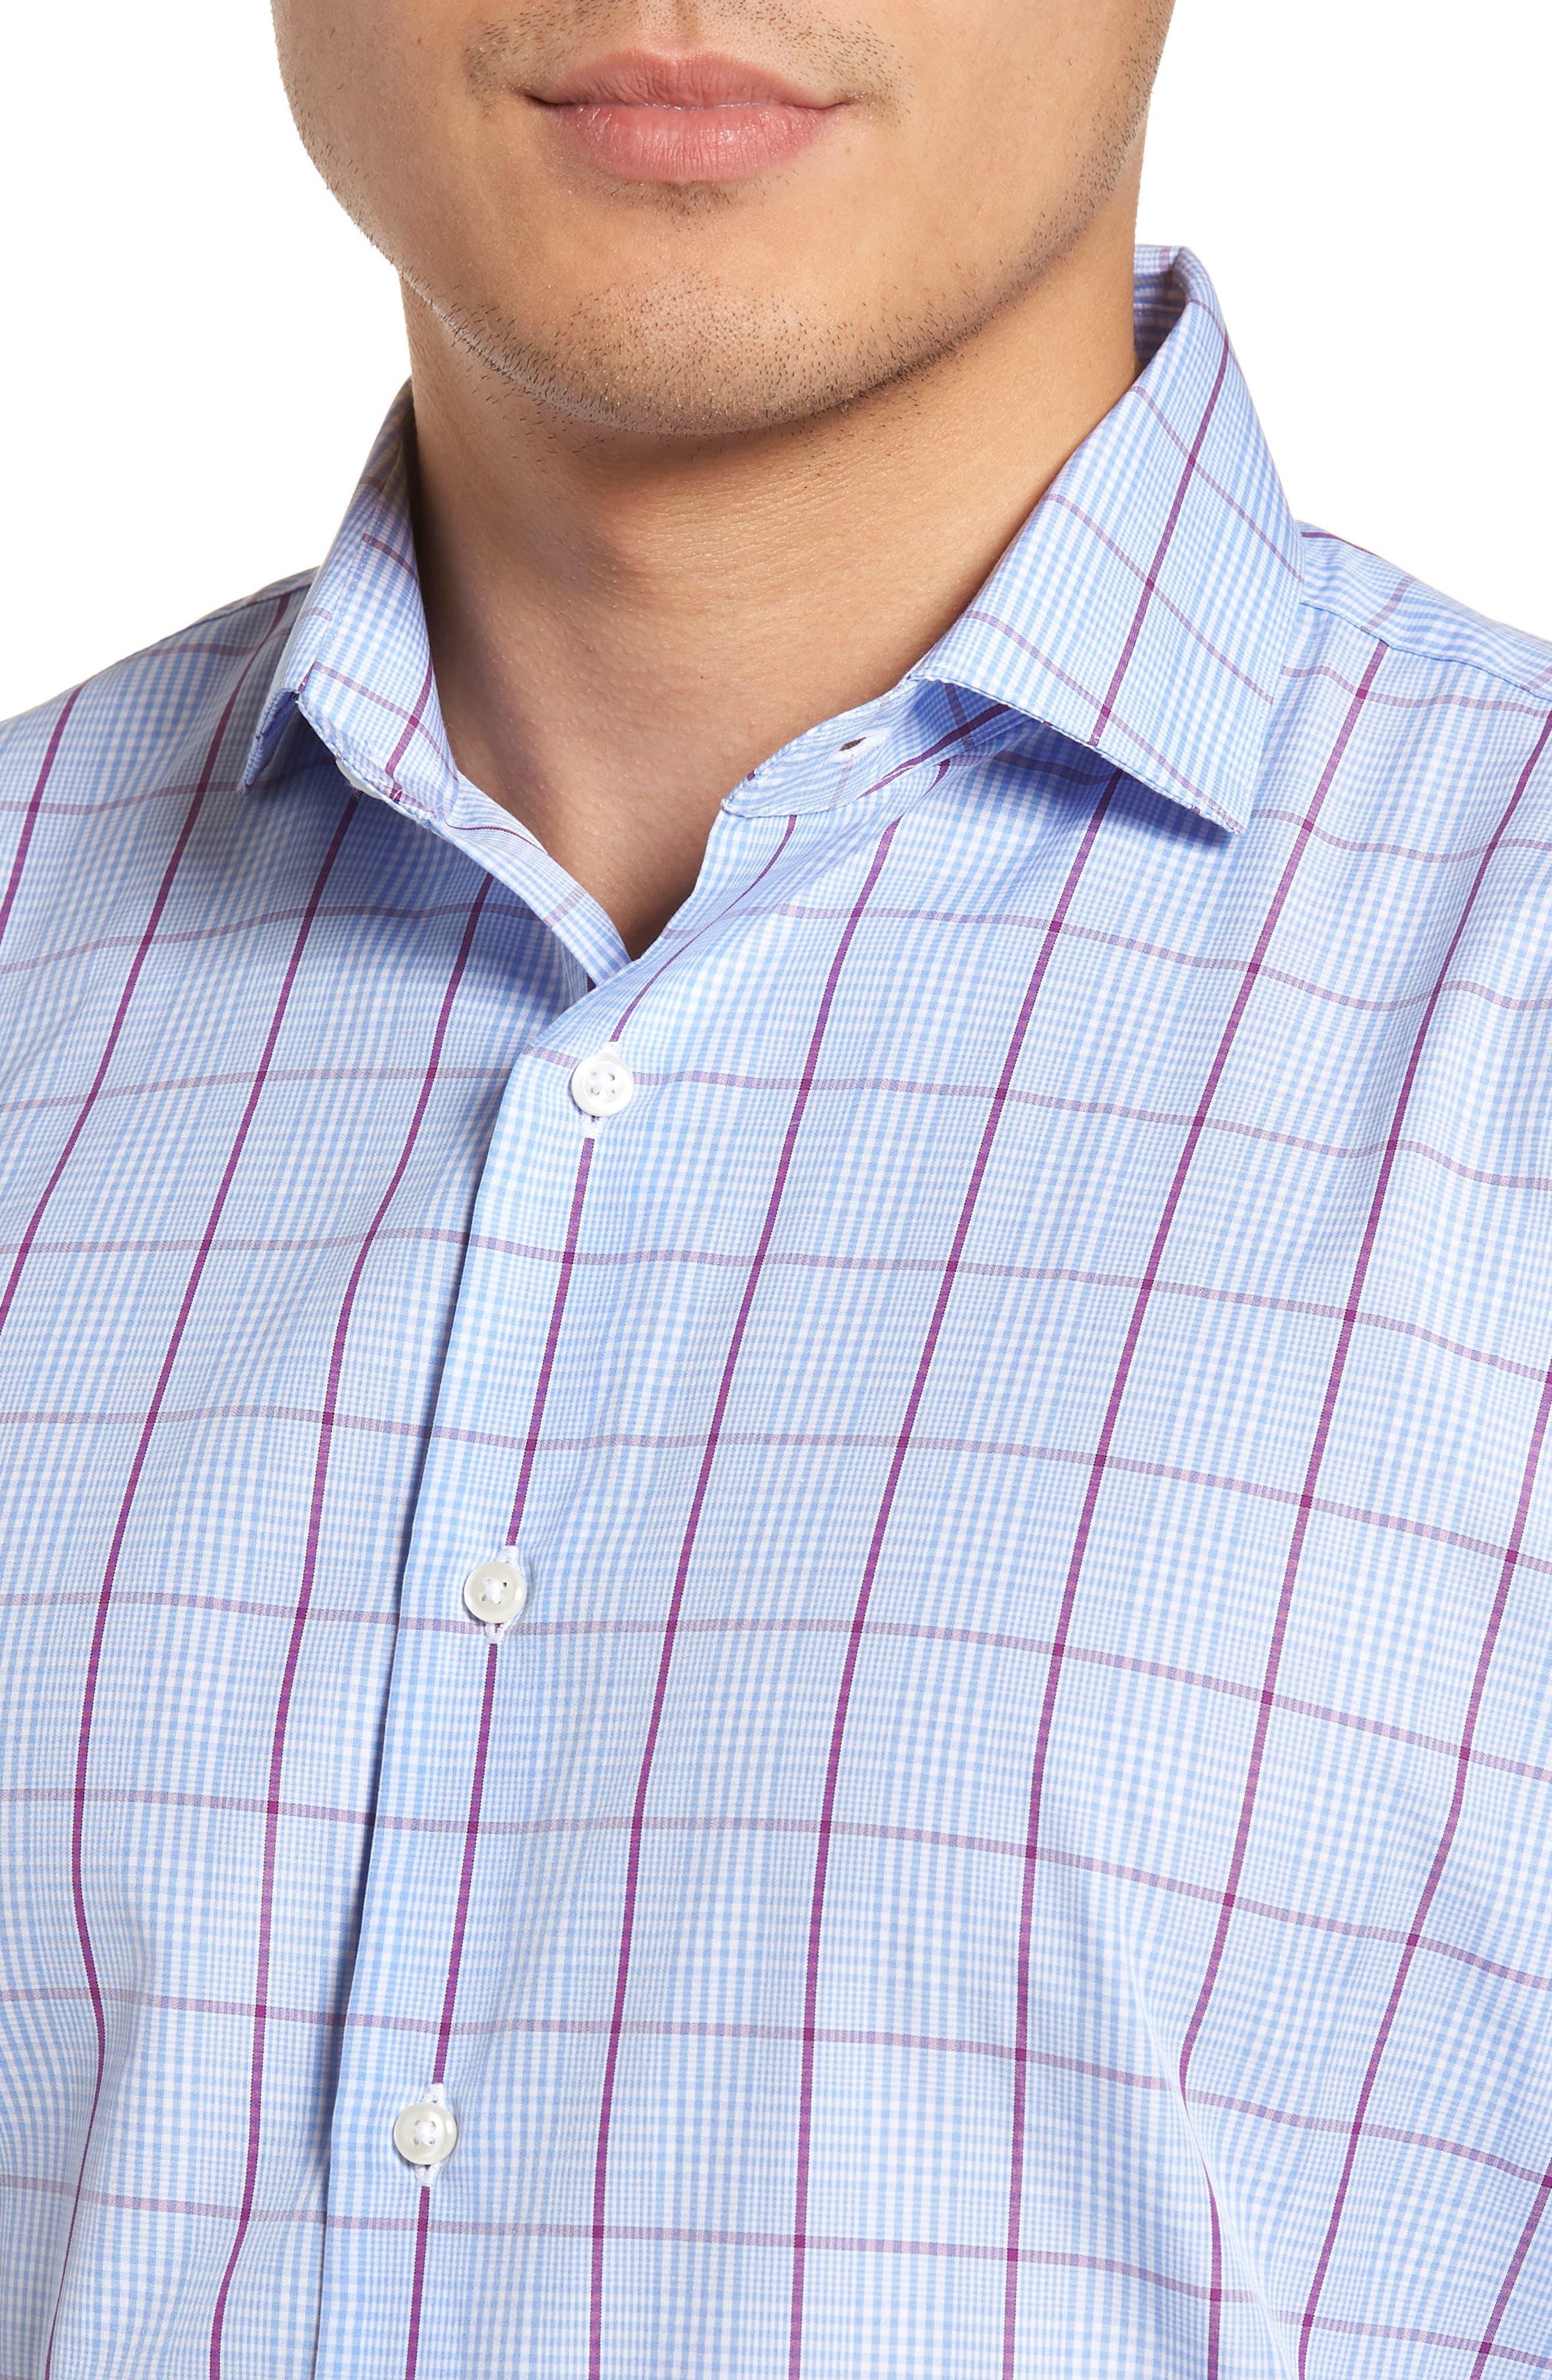 Alternate Image 4  - Nordstrom Men's Shop Trim Fit Plaid Dress Shirt